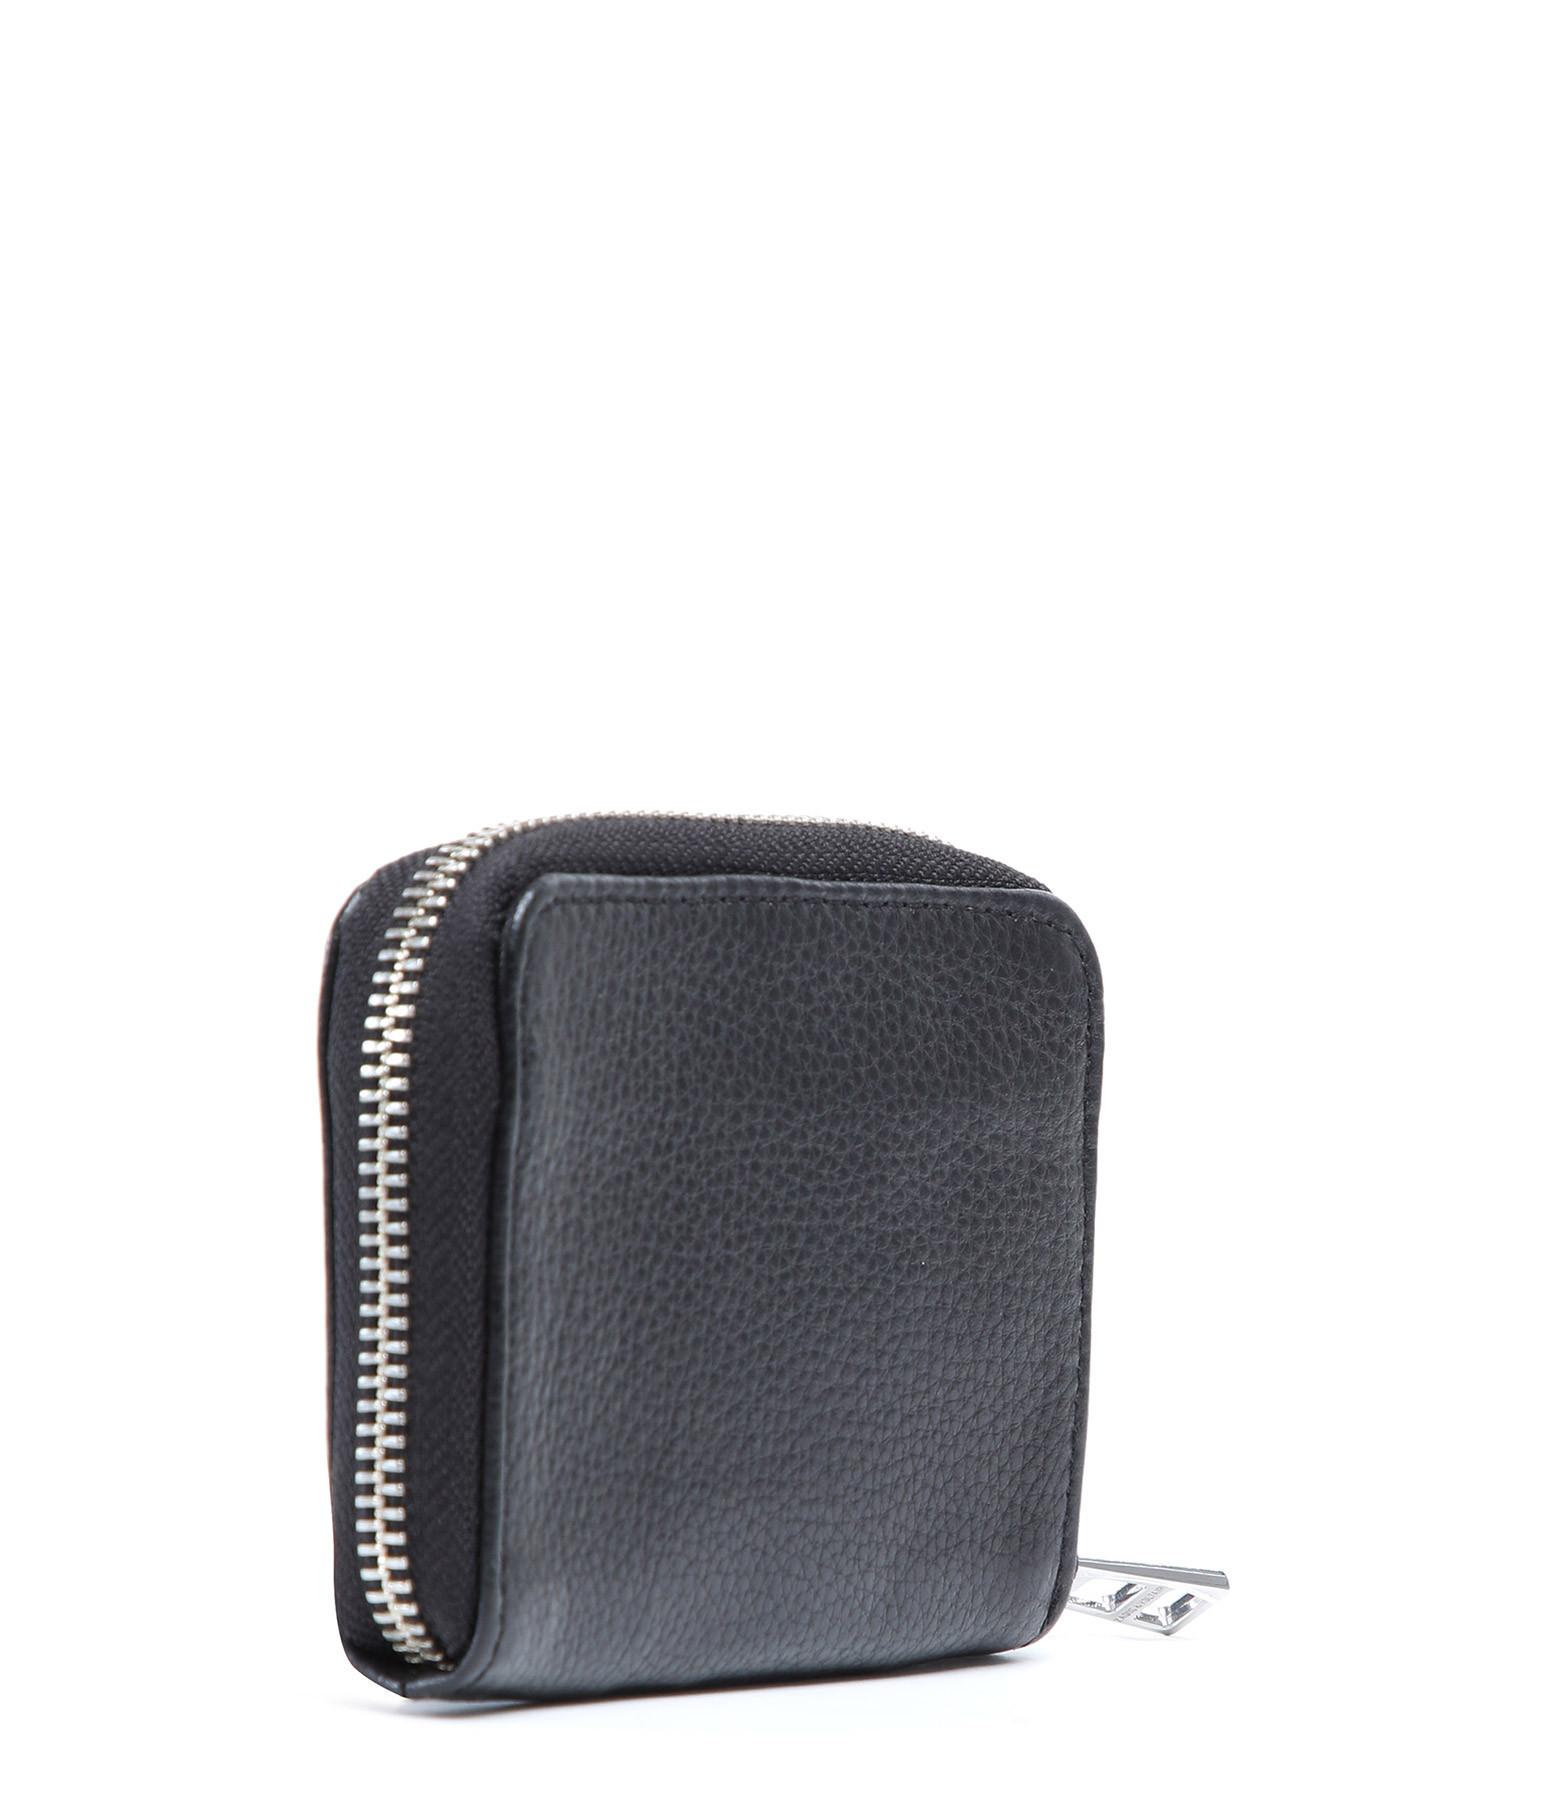 ZADIG & VOLTAIRE - Porte-monnaie Mini ZV Cuir Noir